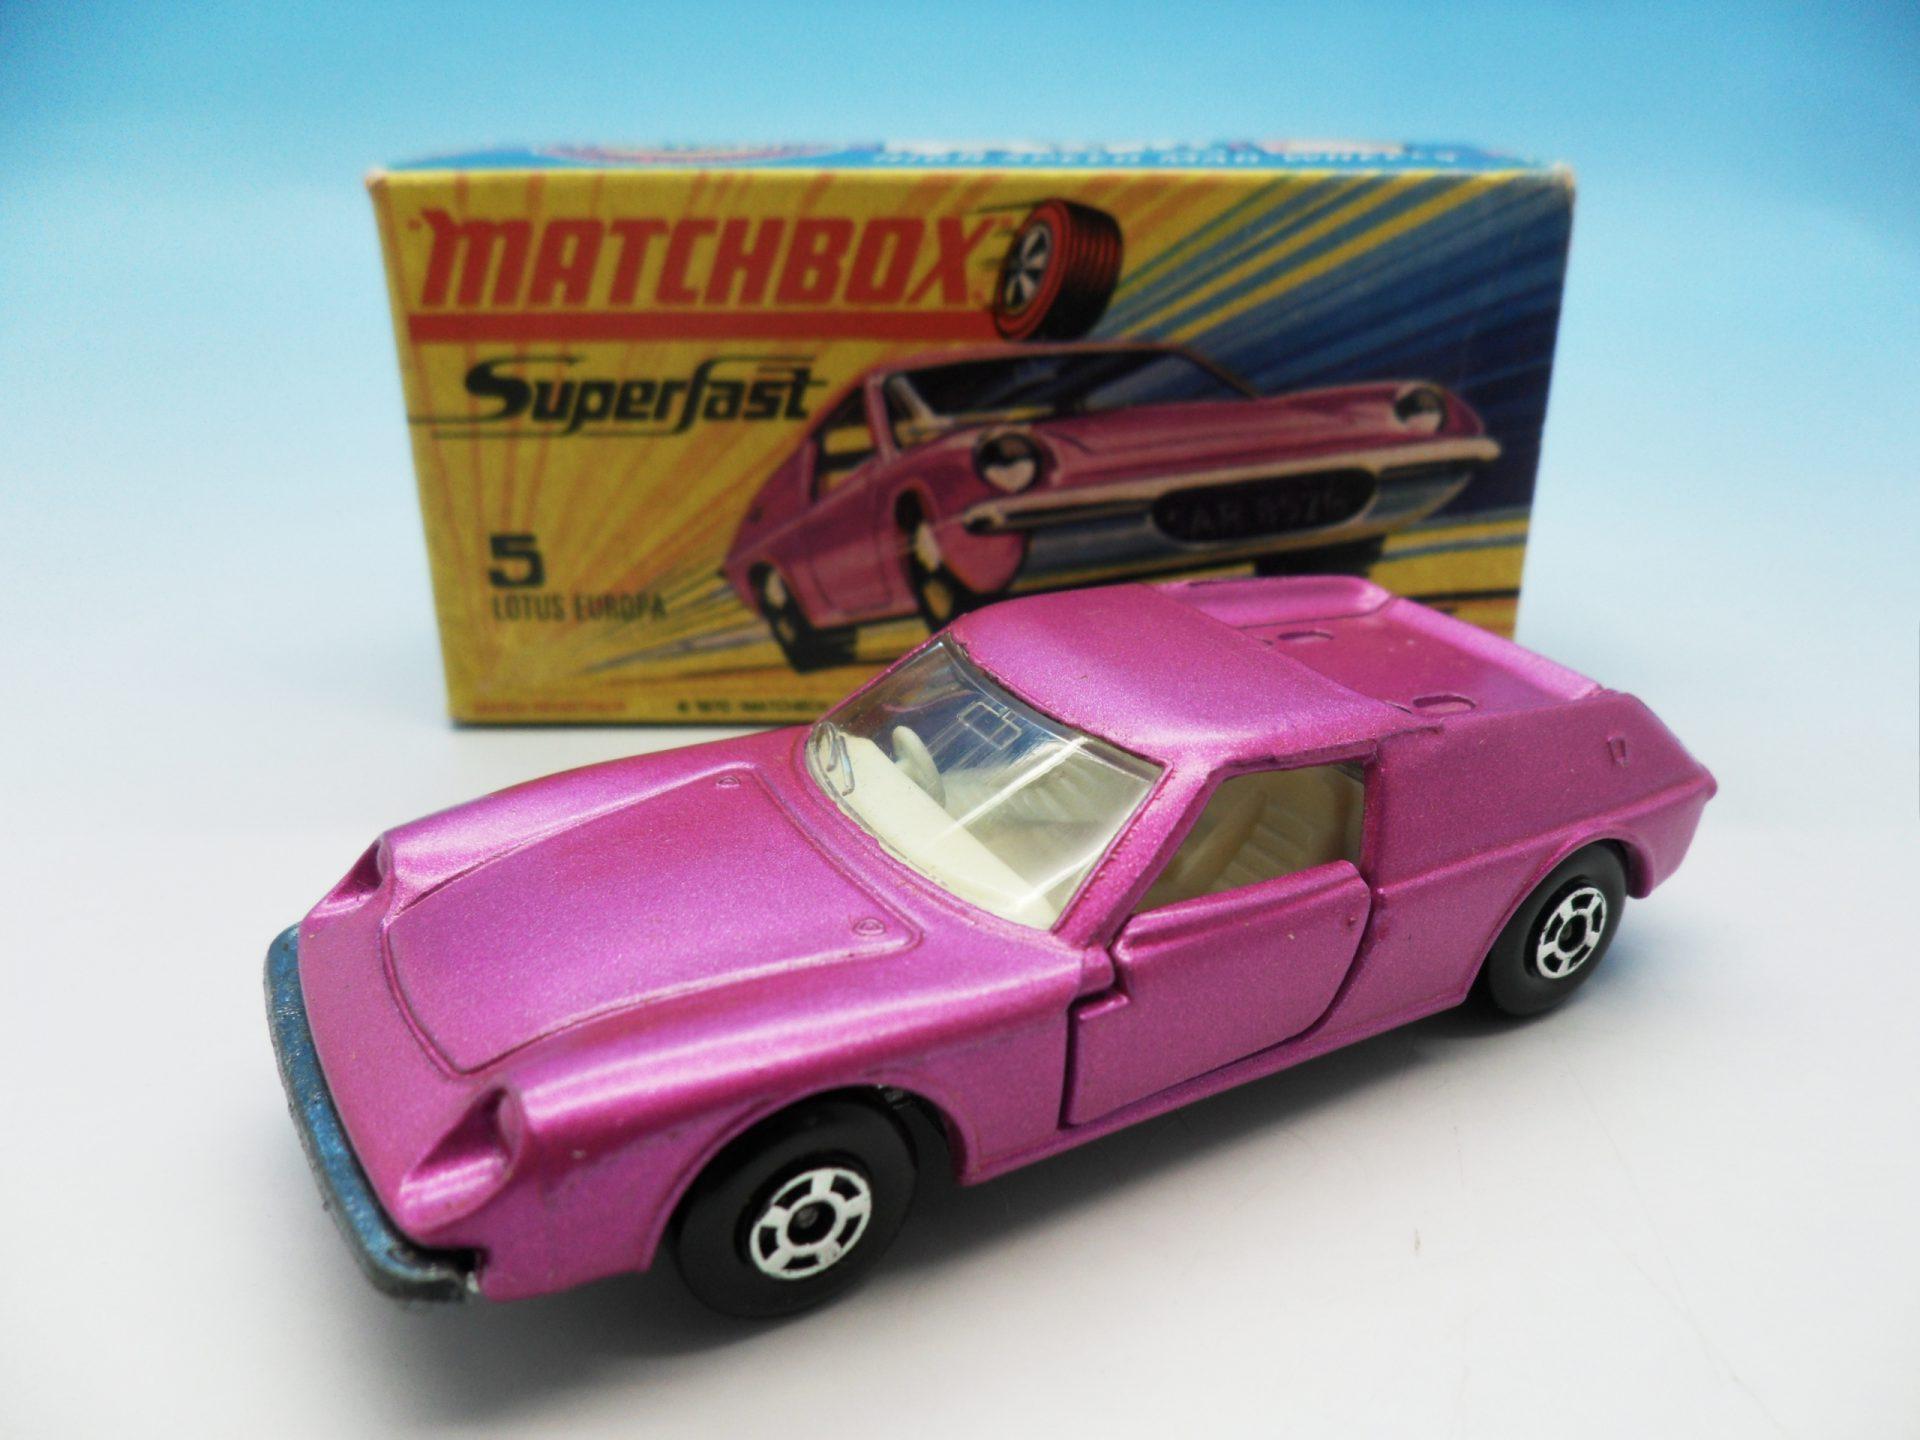 Matchbox Superfast Lotus Europa 5